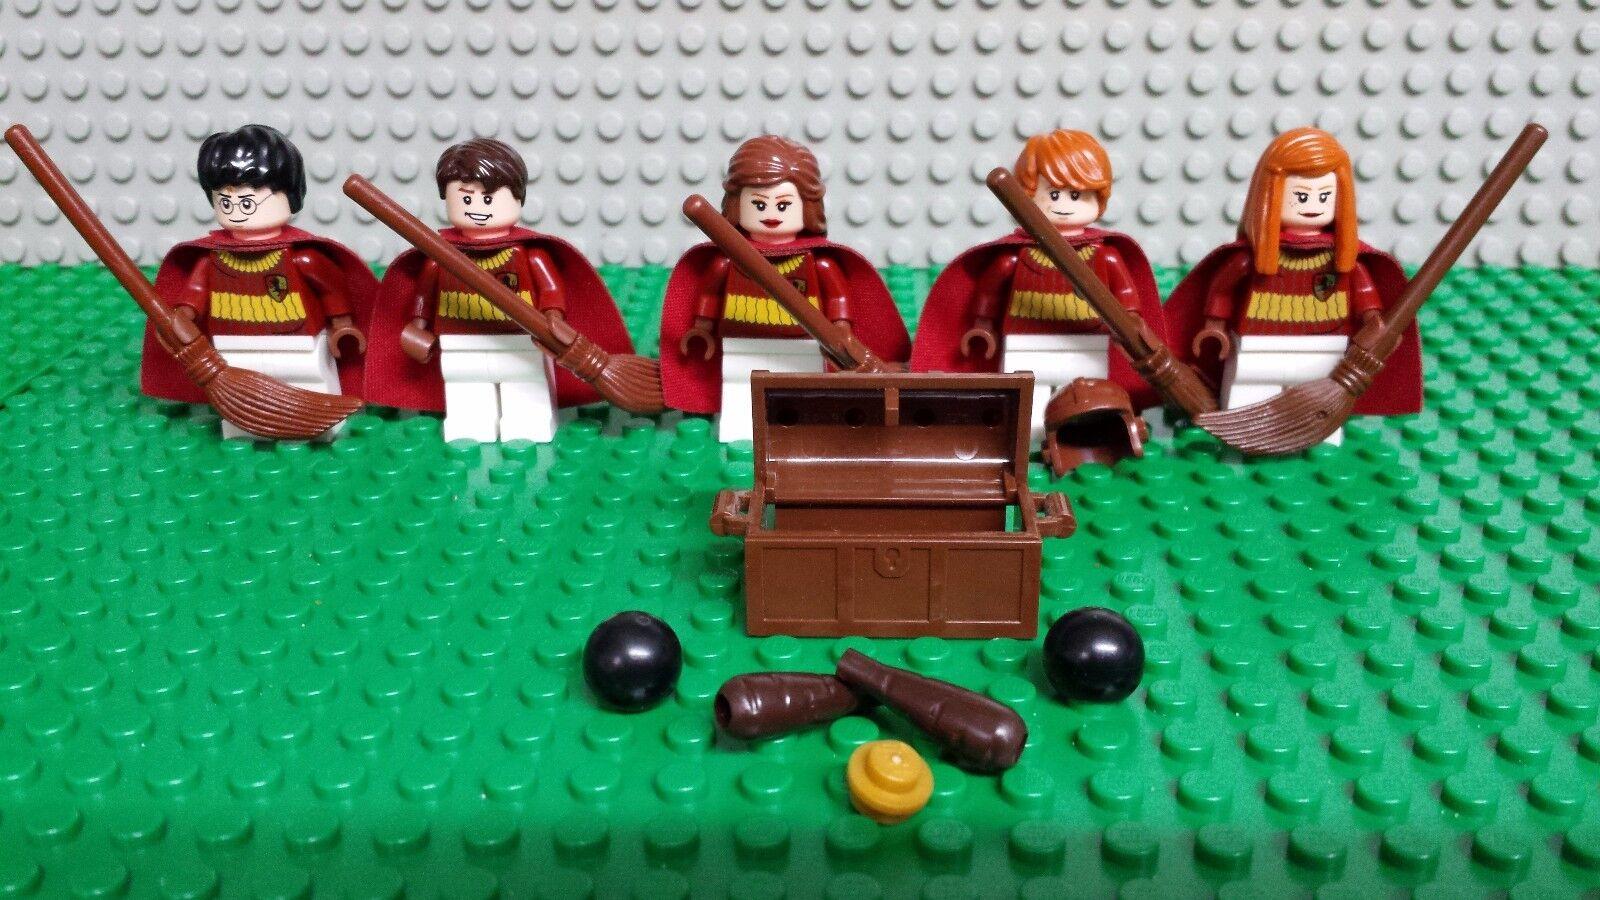 Lego Harry  Potter 4737 Quidditch Match minifigures lot Genuine LEGO NEUF  mieux acheter